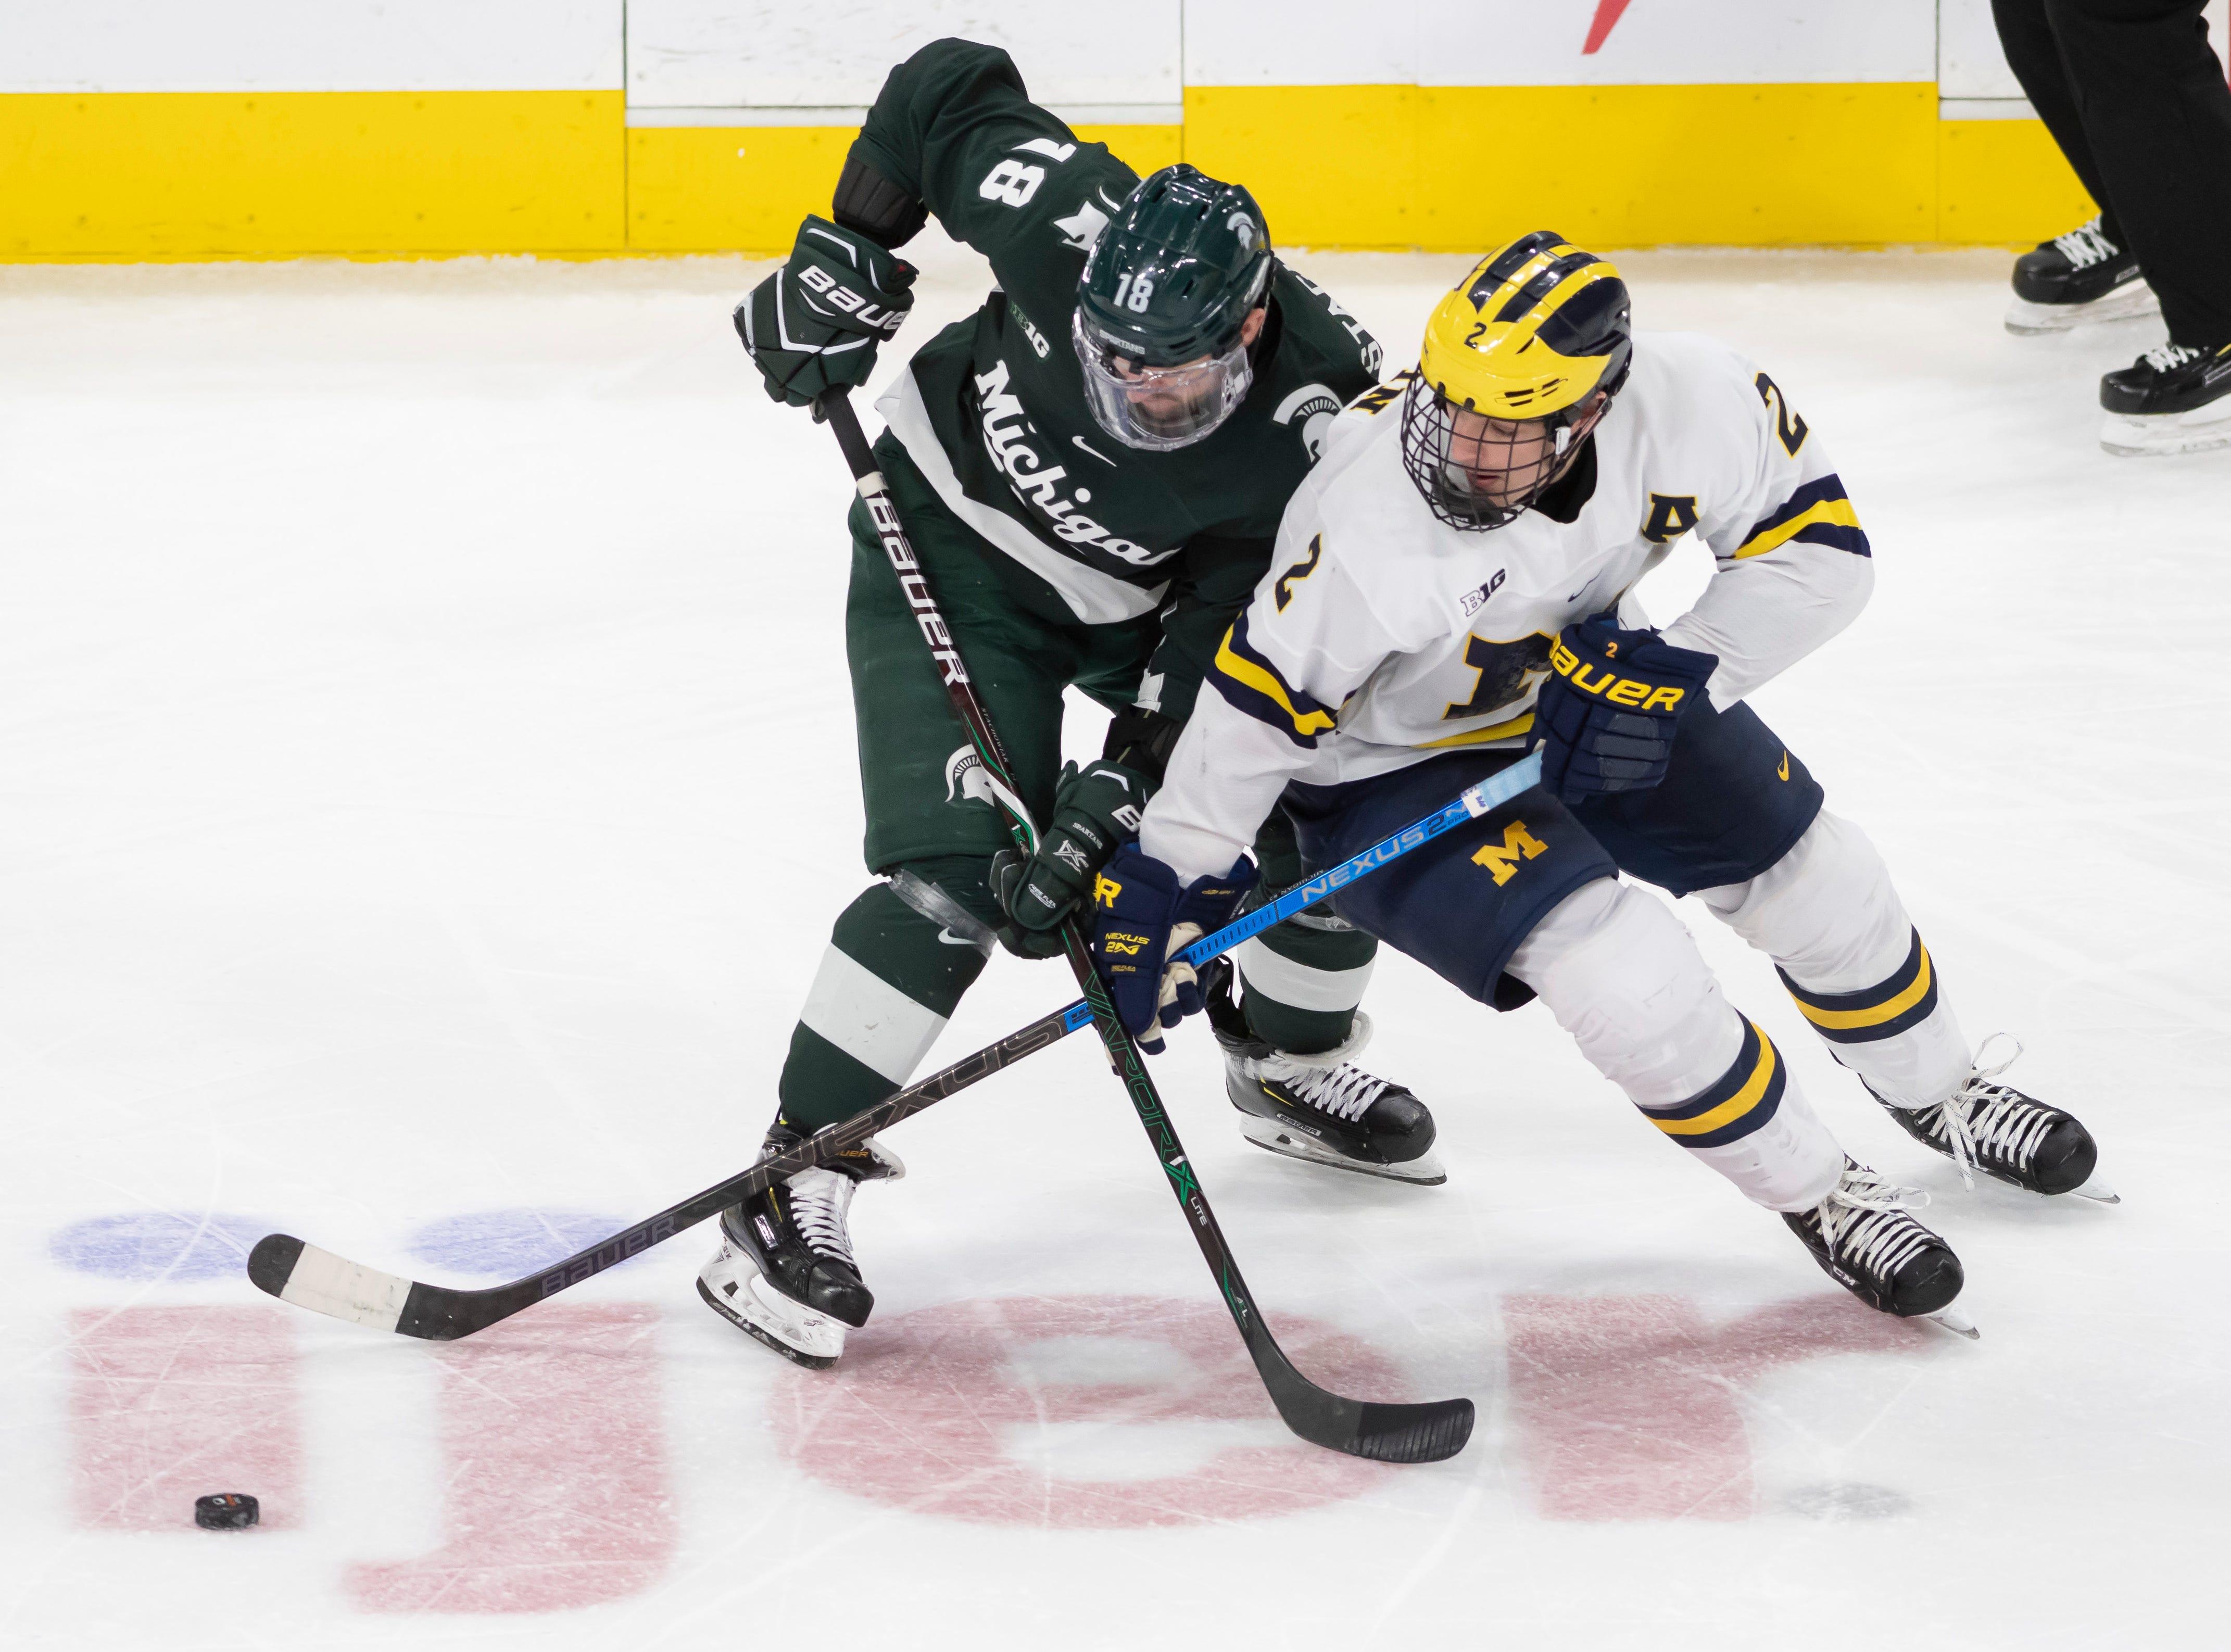 Michigan State forward Wojciech Stachowiak  and Michigan defenseman Luke Martin battle for the puck in the third period.